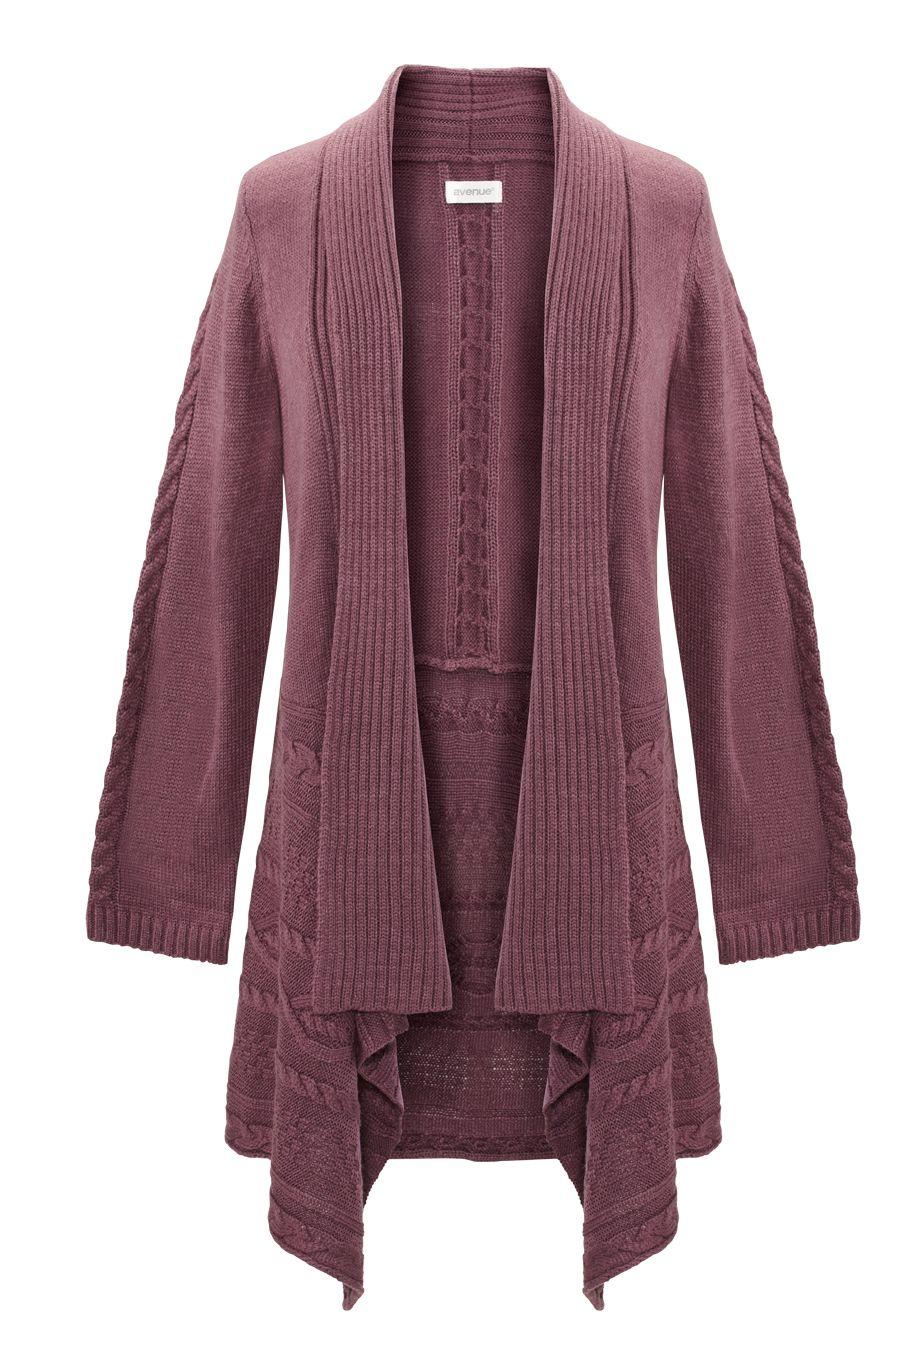 Plus Size Cableknit Trim Cardigan | Plus Size Sweaters 40%-60% off ...